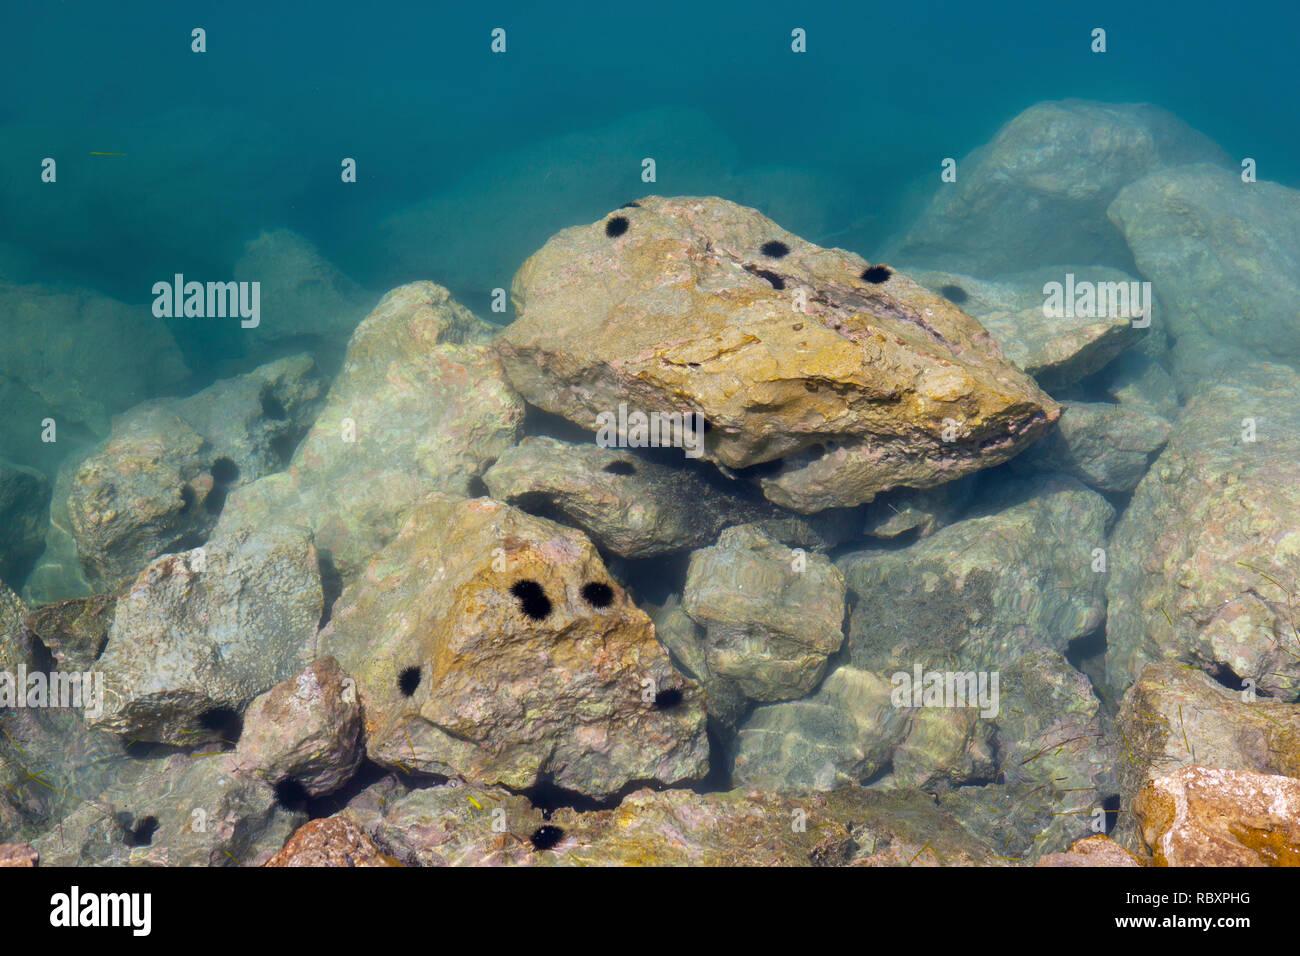 Sea urchins on rocks in Poros marina, Kefalonia, Greece - Stock Image